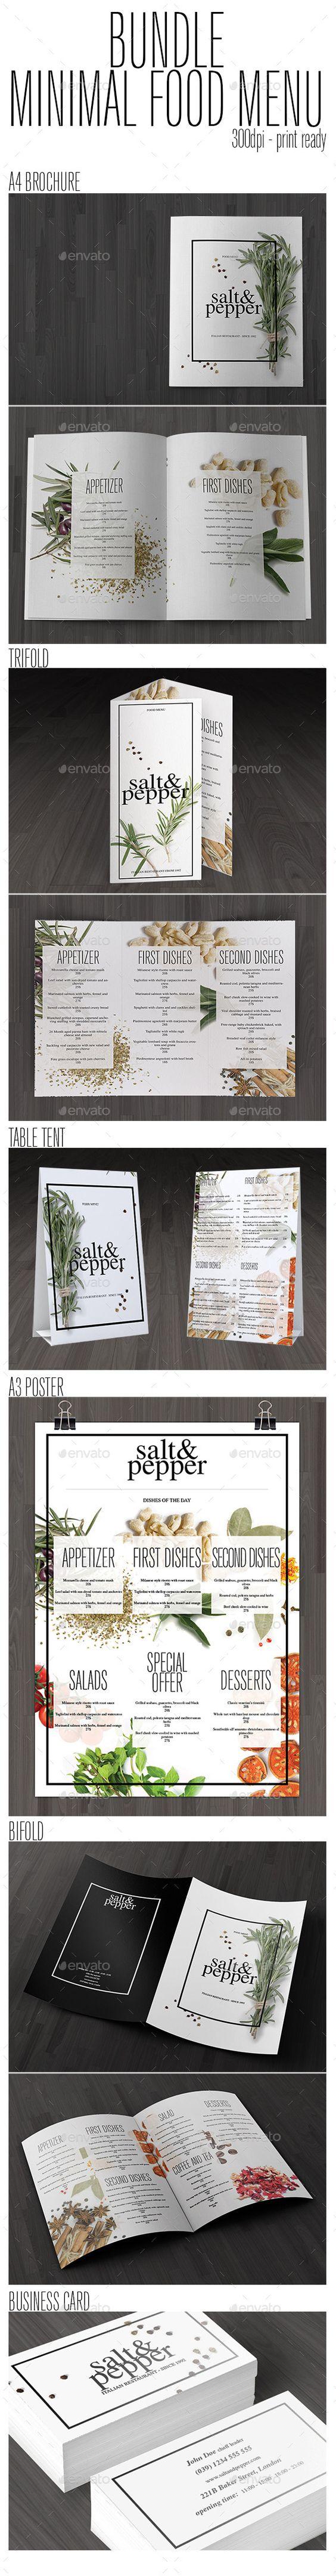 Bundle Minimal Food Menu Template #design Download: http://graphicriver.net/item/bundle-minimal-food-menu/11559390?ref=ksioks